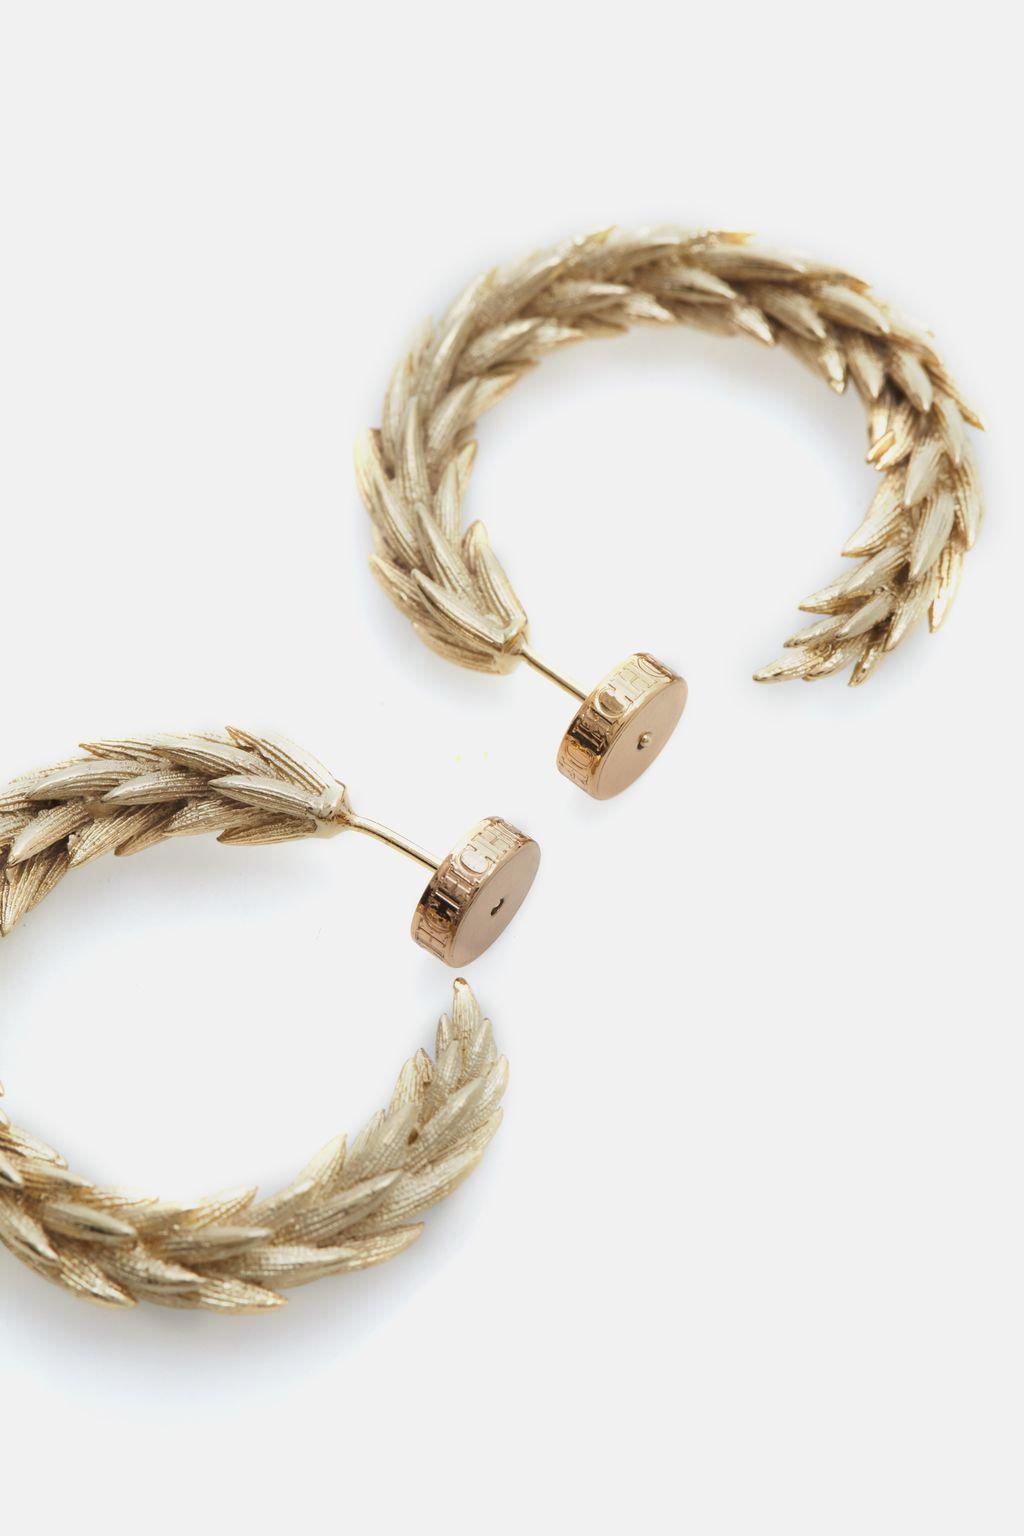 Champ de Blé hoop earrings